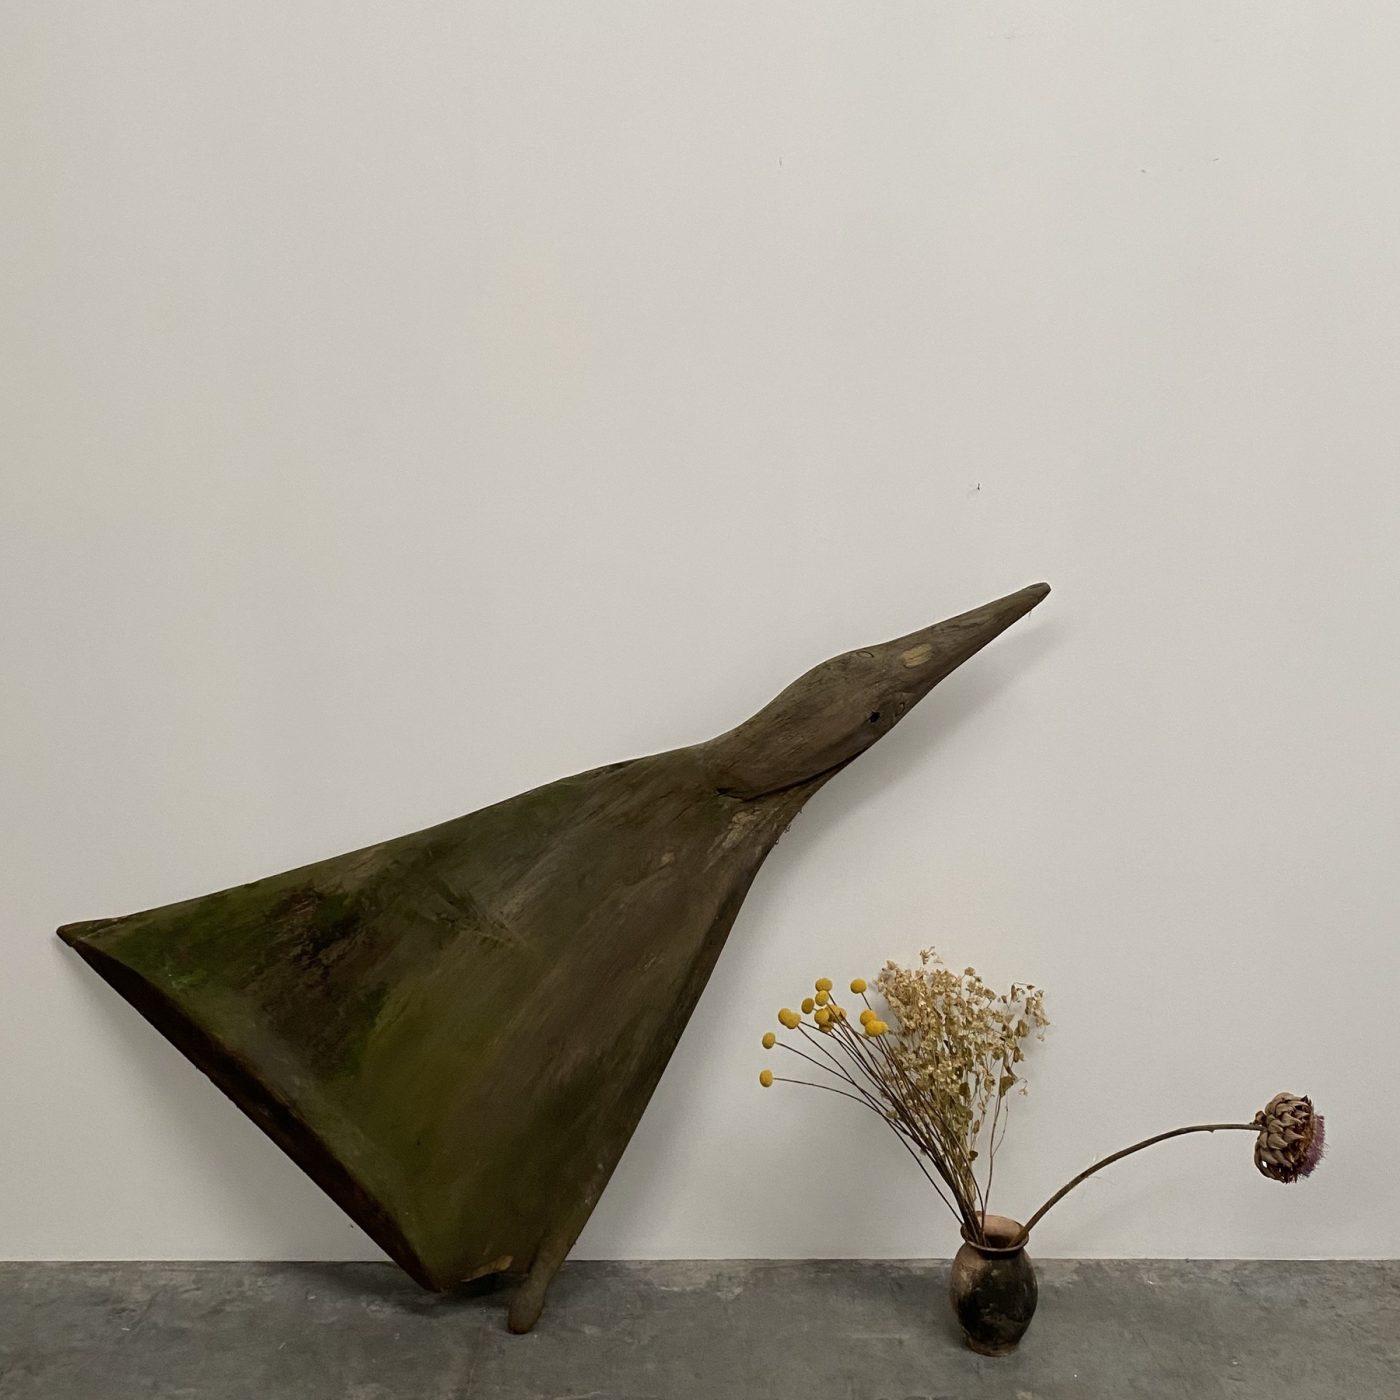 objet-vagabond-wooden-sculpture0006